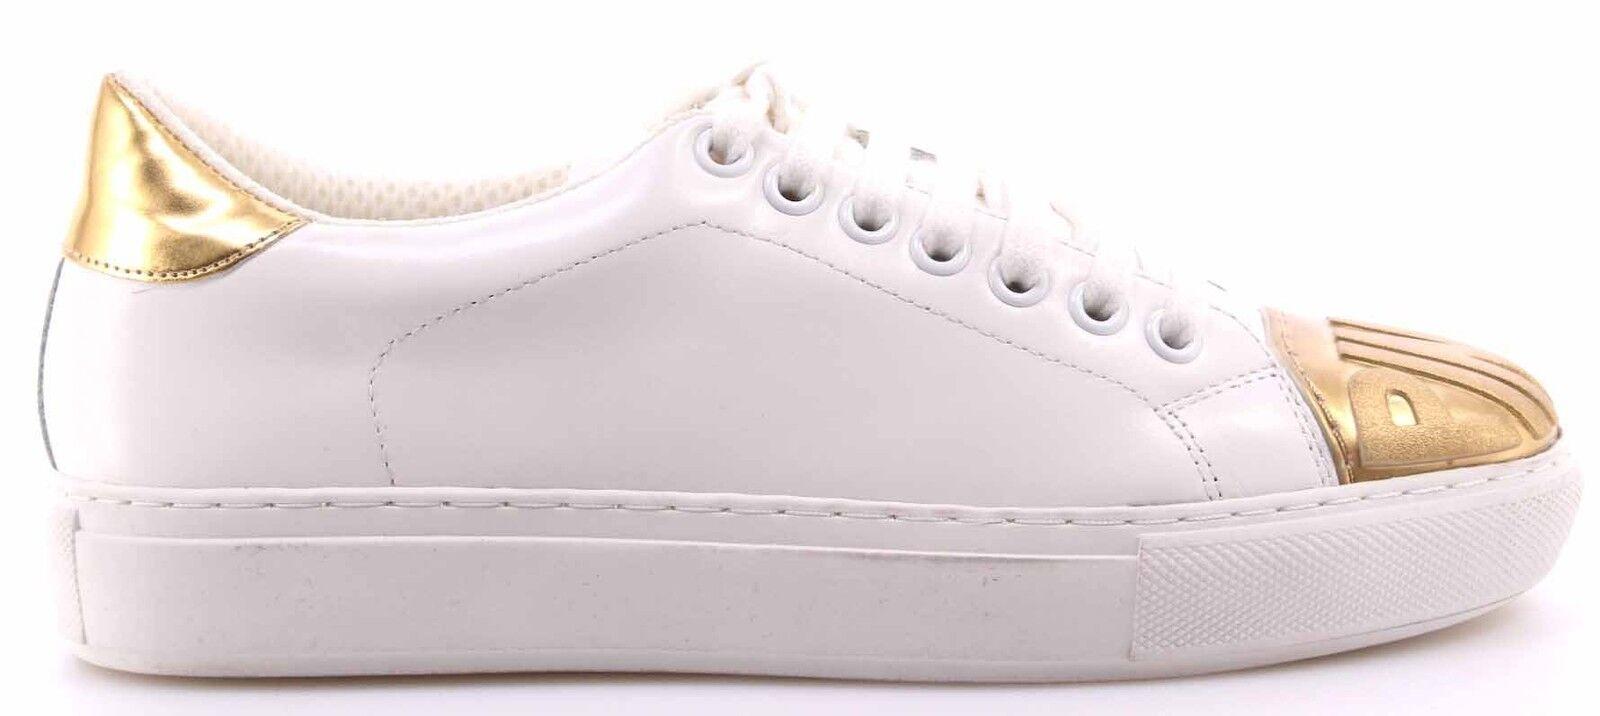 Damen Schuhe Sneakers PINKO Shine Baby Ametista 1 Bianco Oro Leder Weiss Neu New